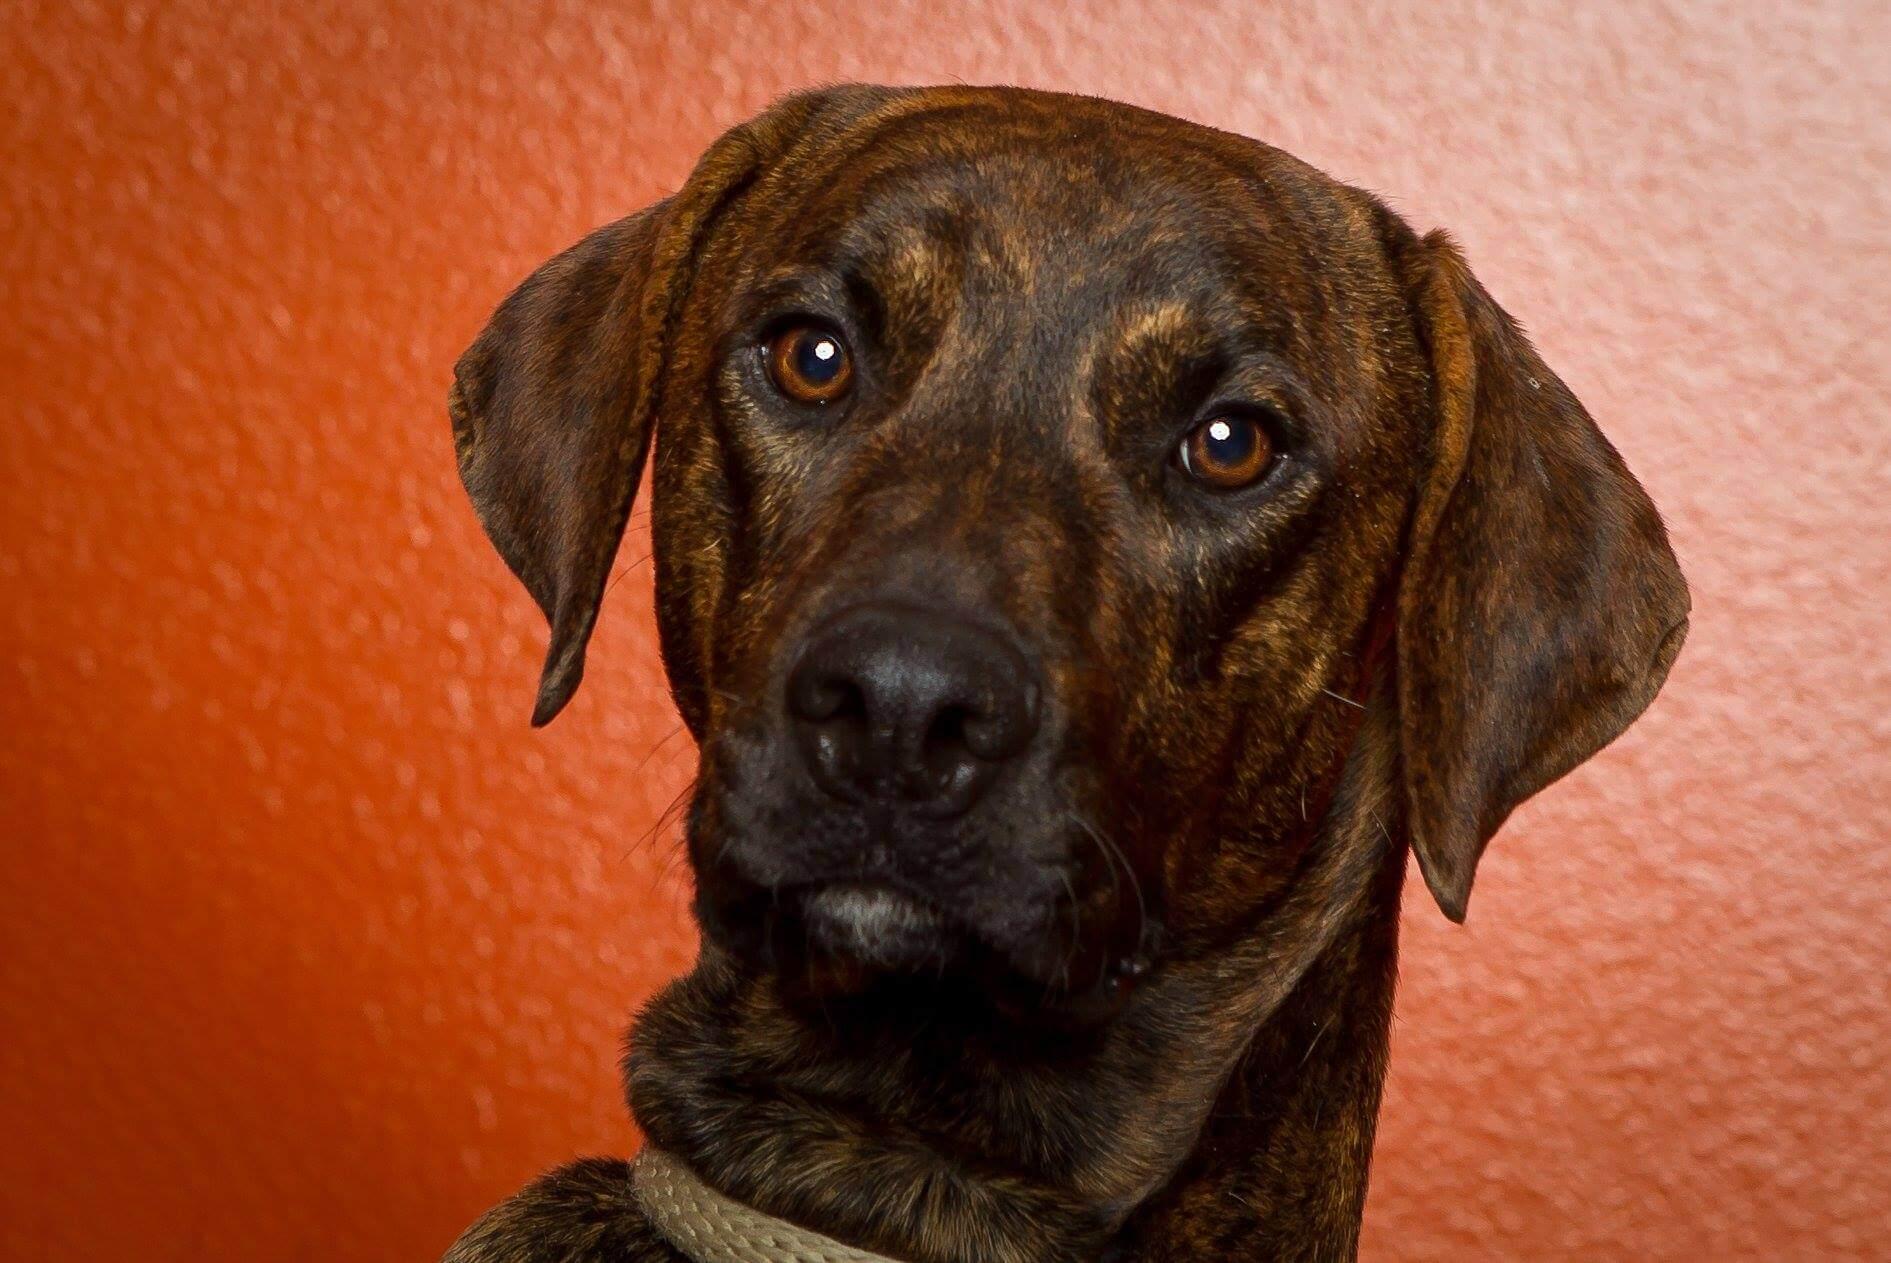 WAGS dog Camo needs foster